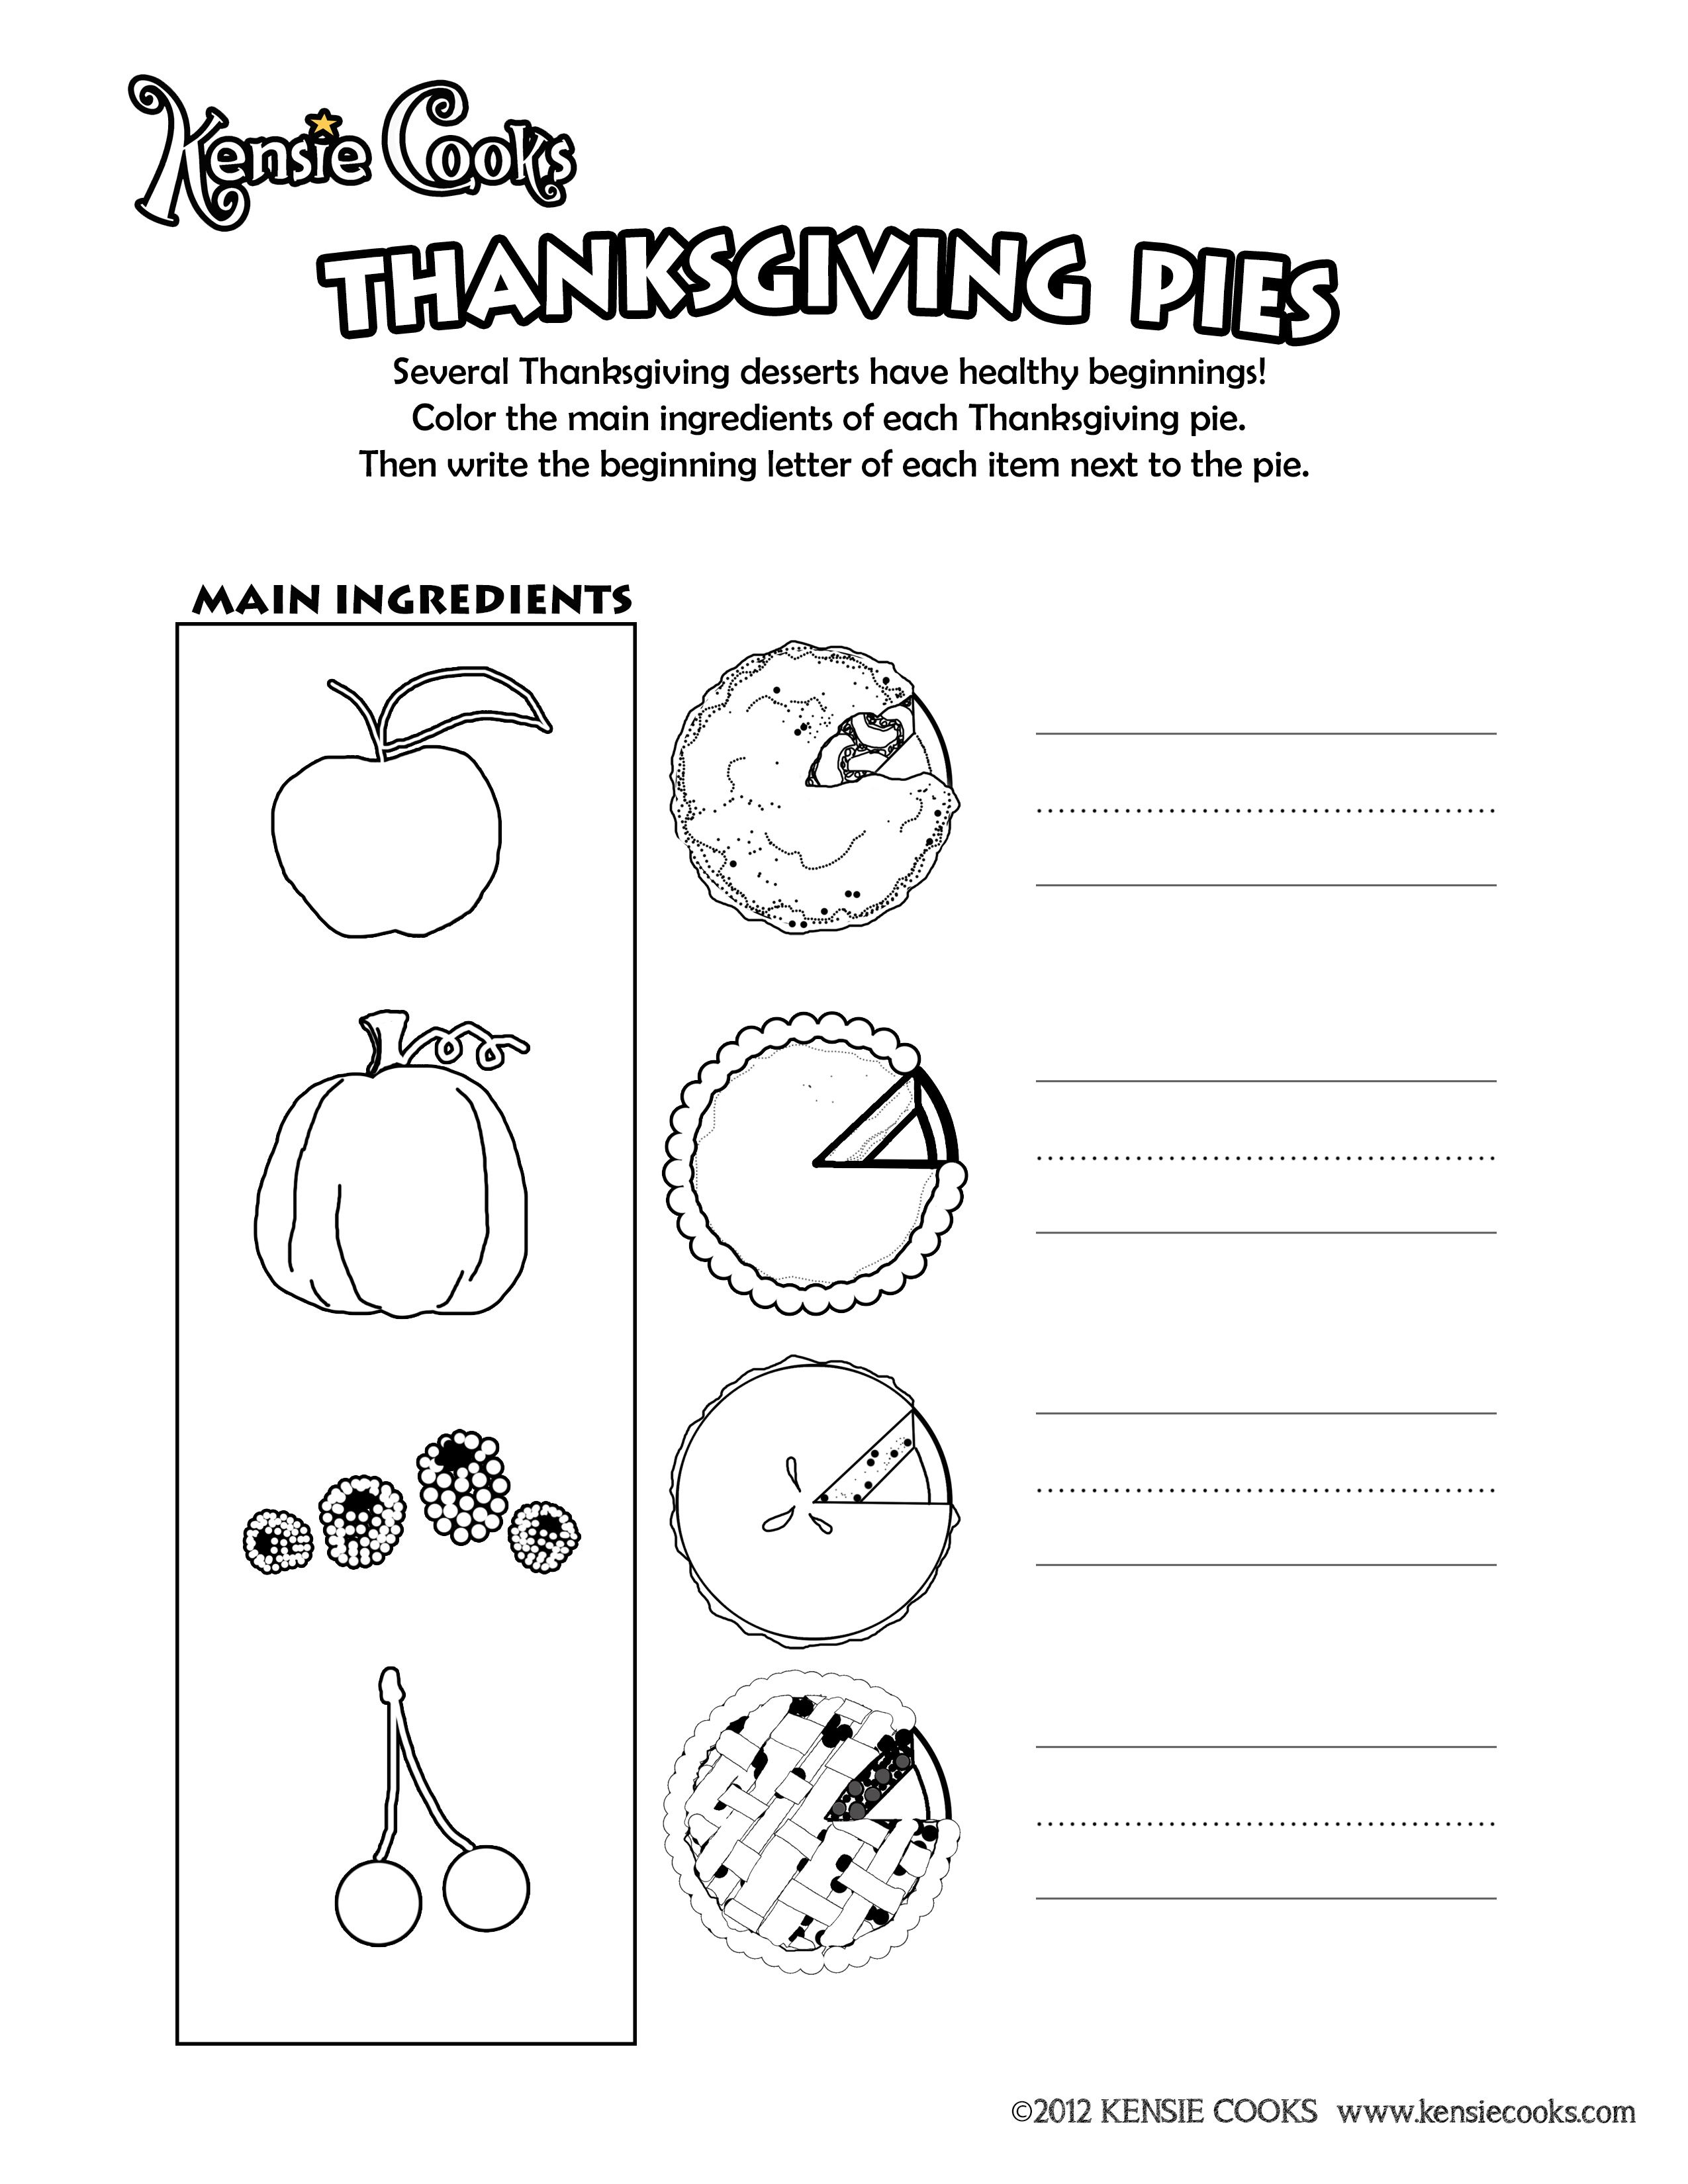 Kensie Cooks Thanksgiving Activity Sheet